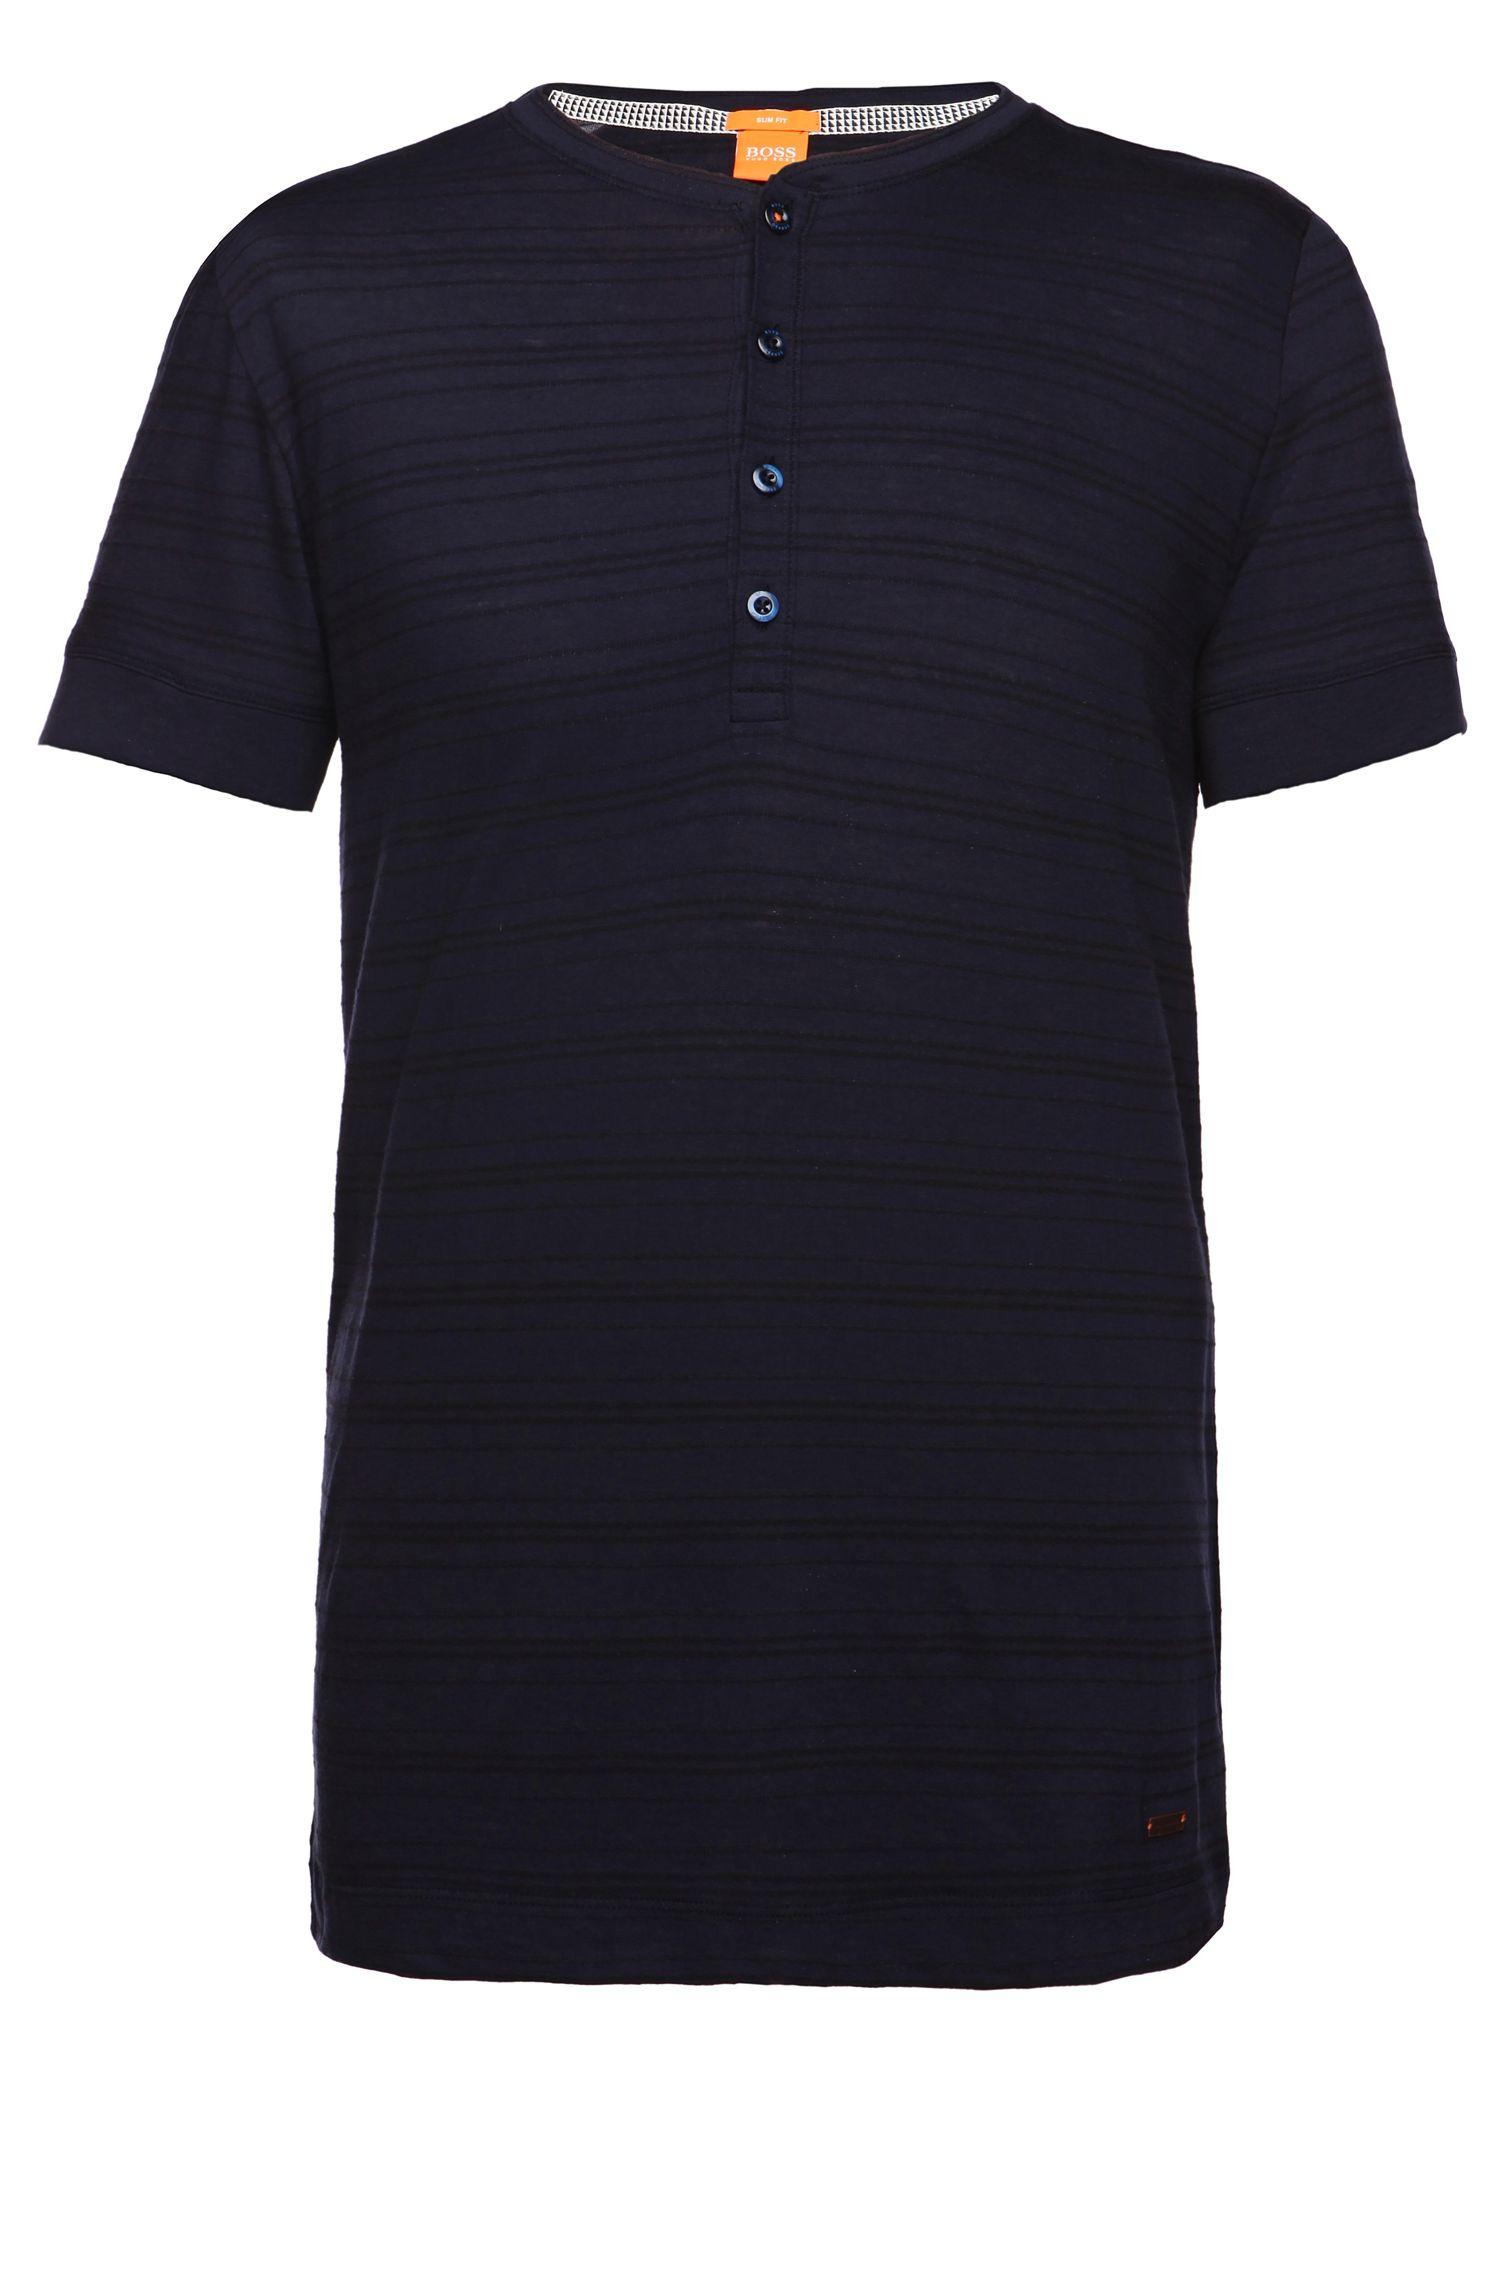 T-Shirt ´Tempesto` aus Baumwoll-Mix